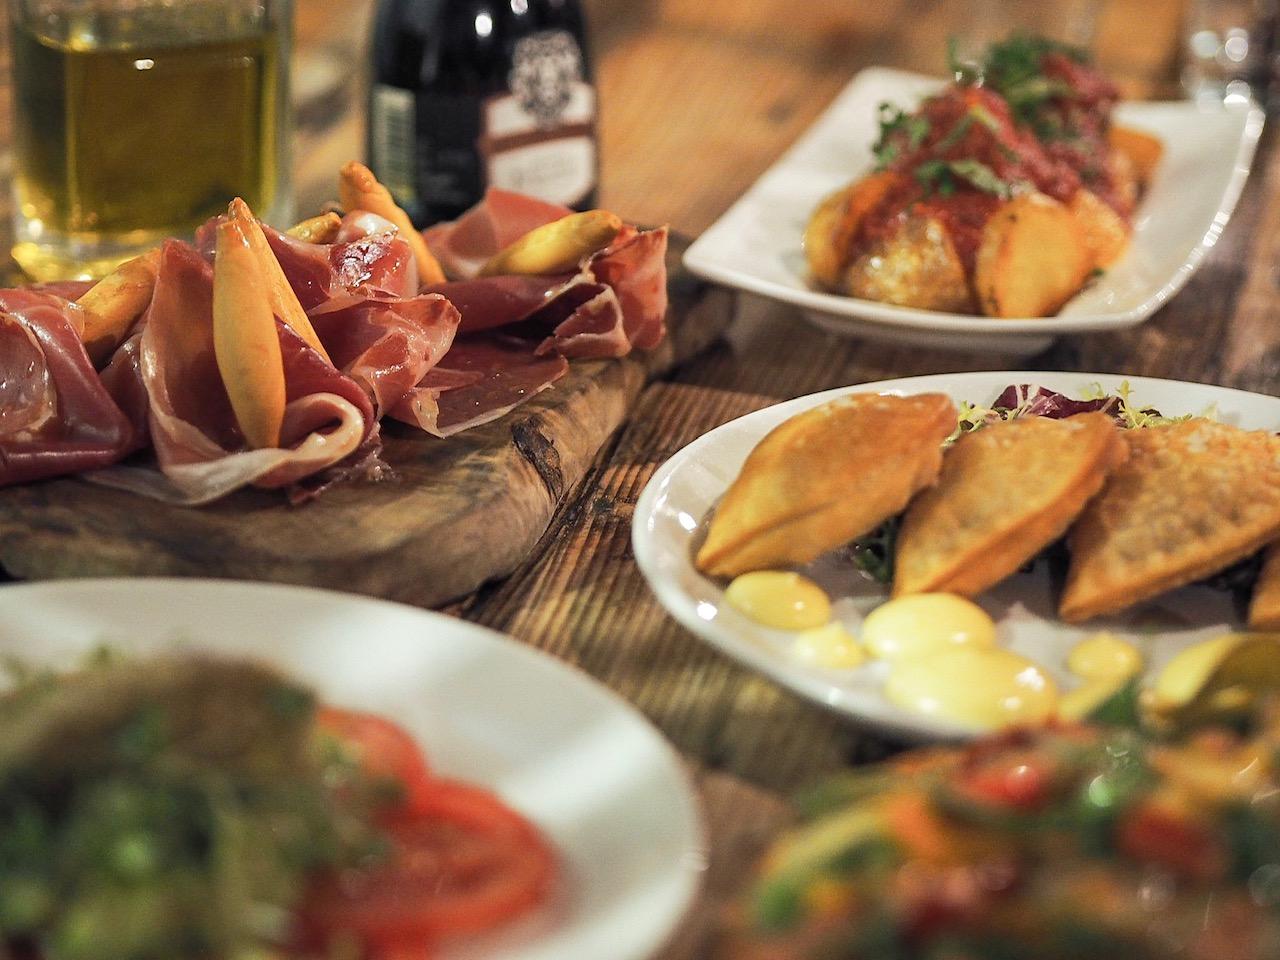 Serrano ham, tuna pastries and patatas bravas at Evuna Manchester.